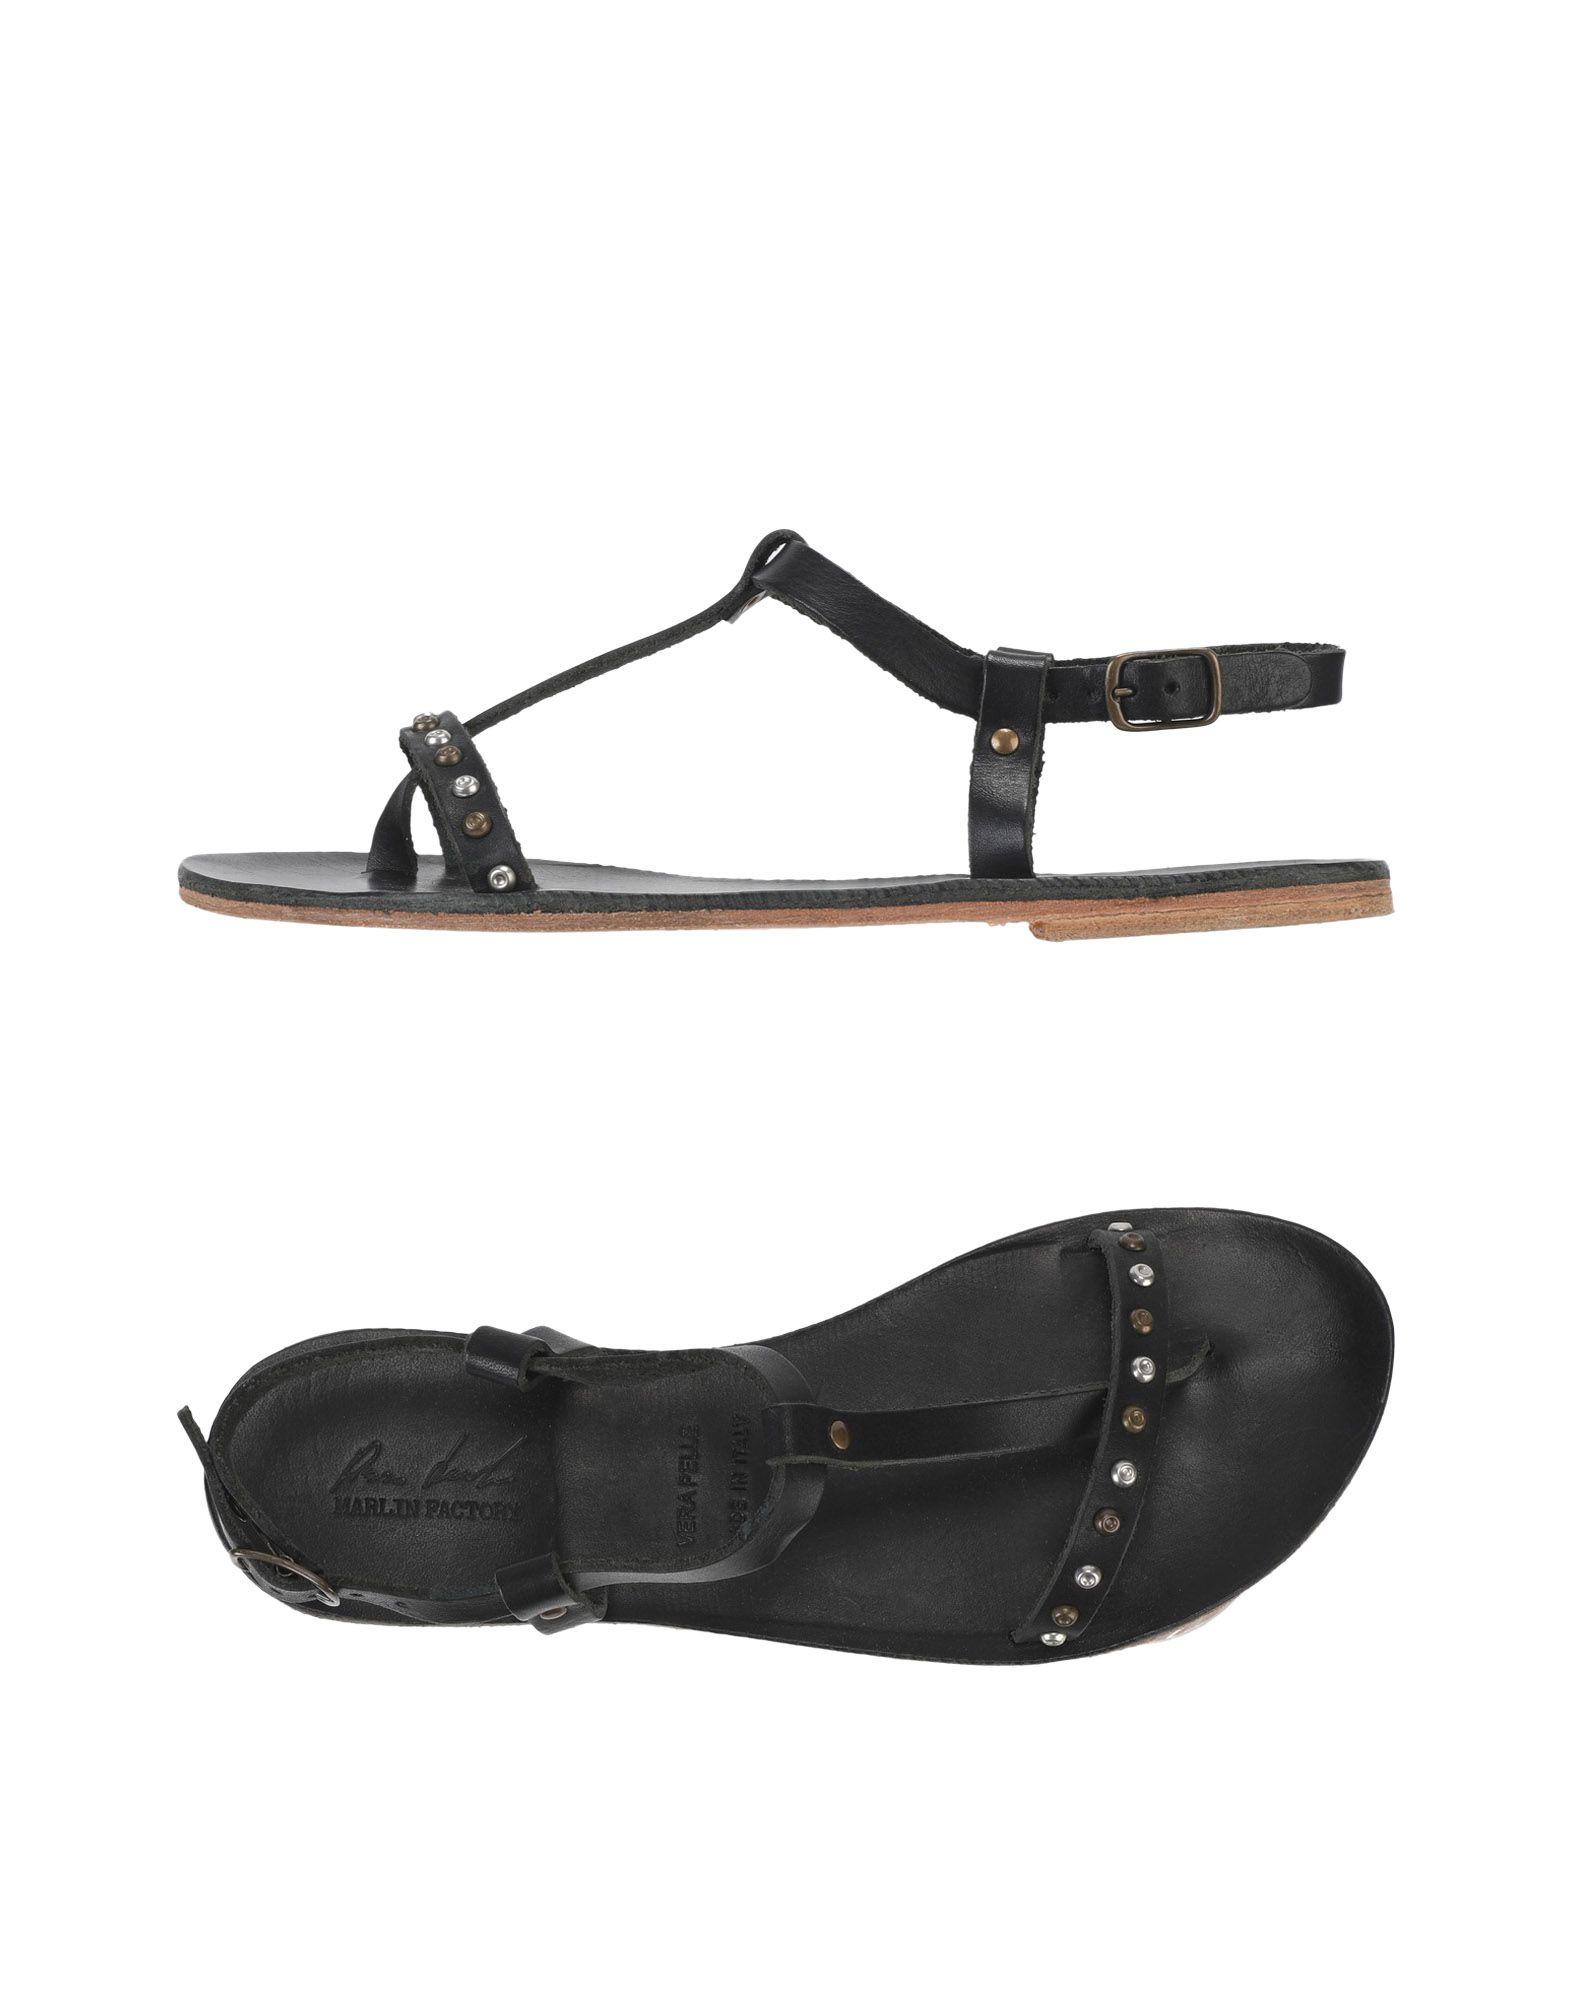 MARLIN FACTORY Toe strap sandals